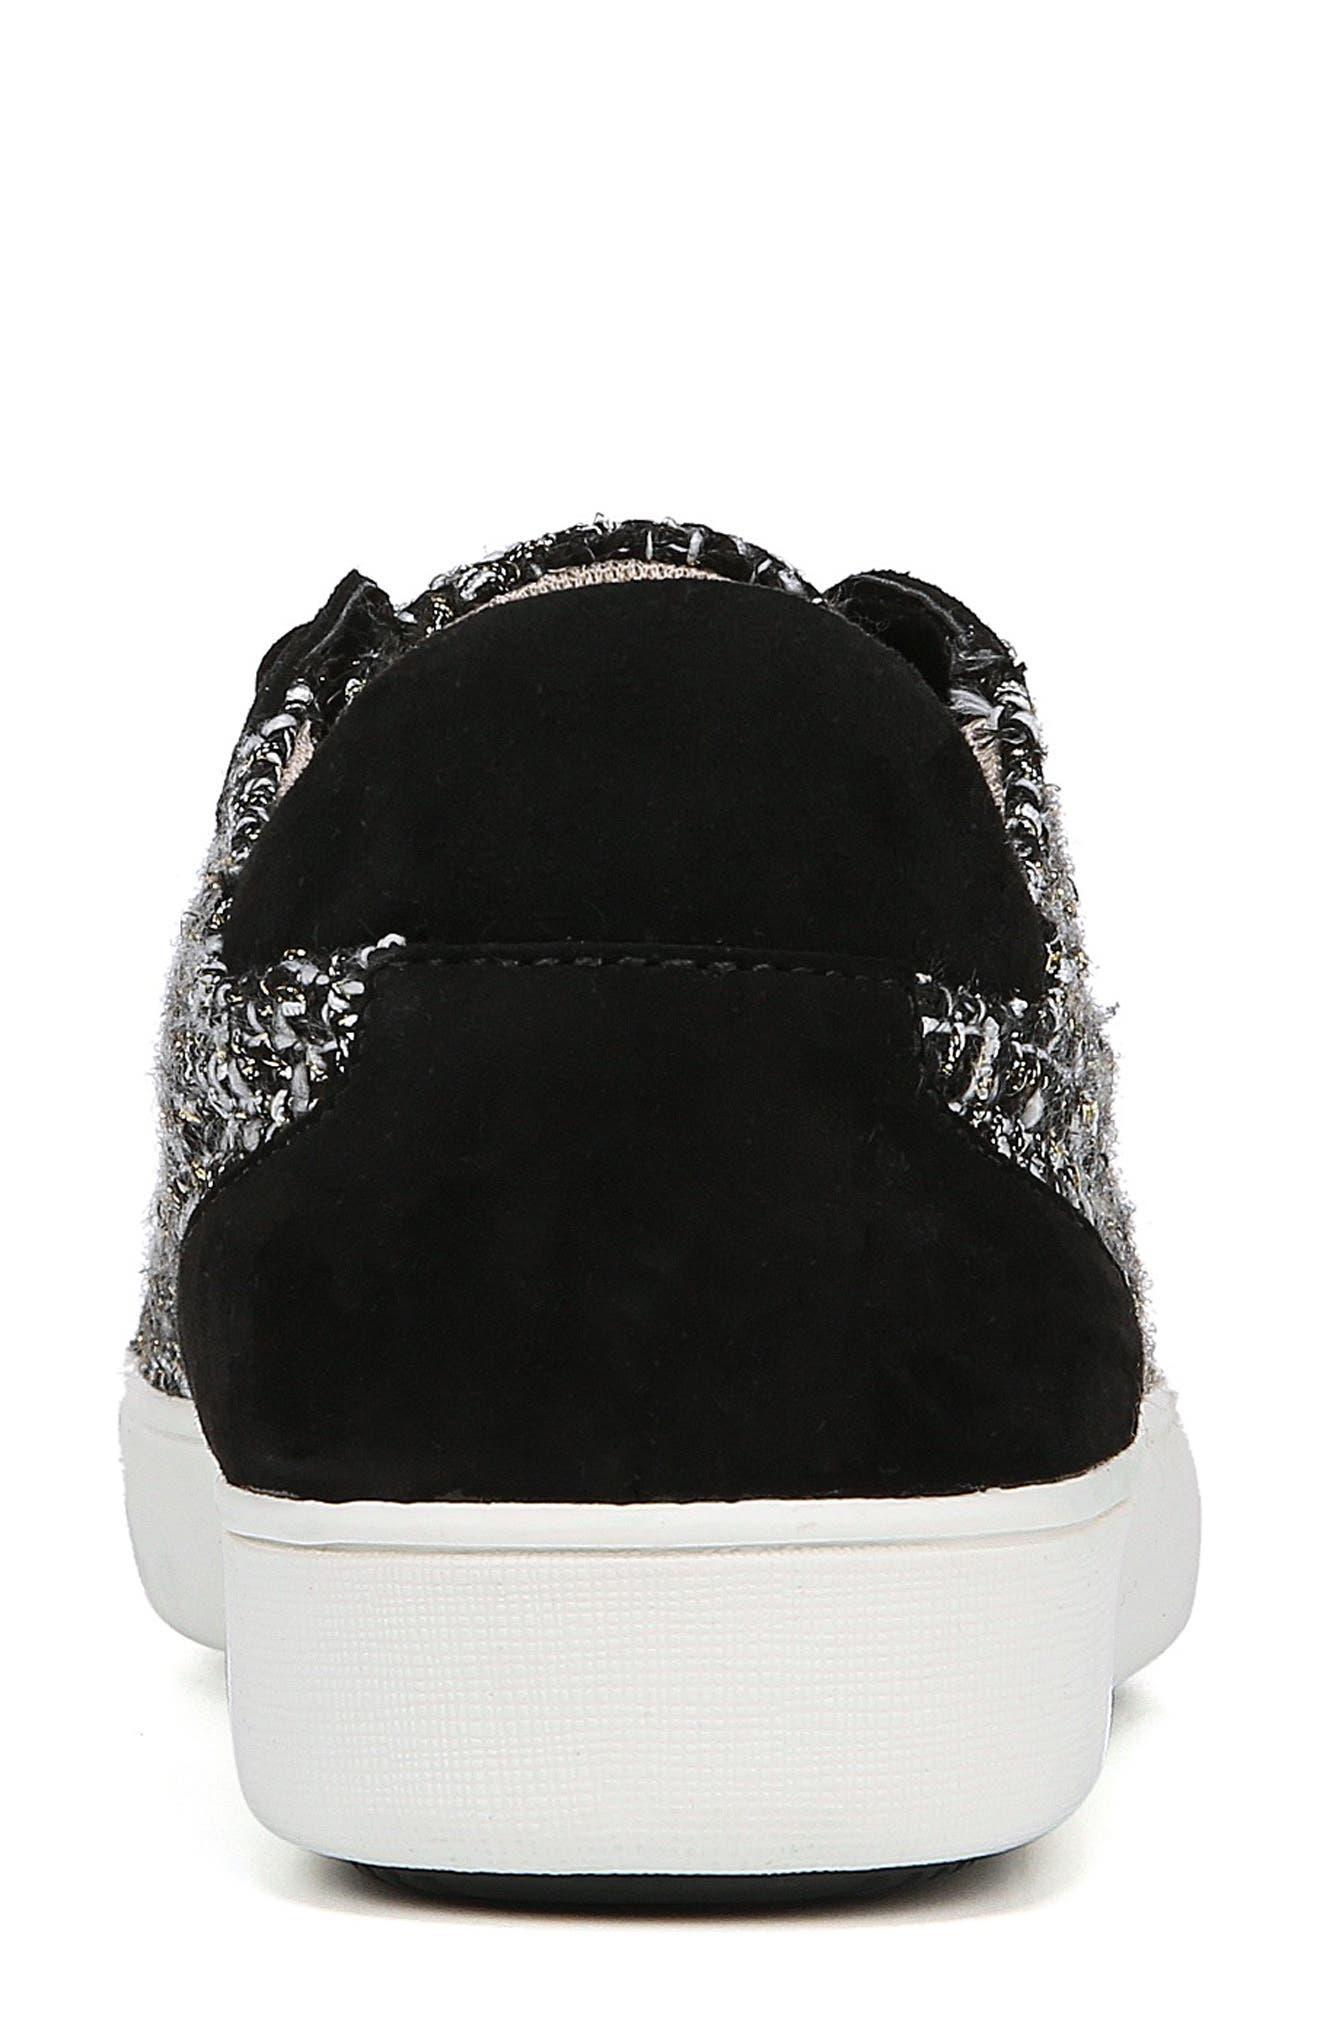 Morrison Sneaker,                             Alternate thumbnail 9, color,                             BLACK/ WHITE TWEED FABRIC